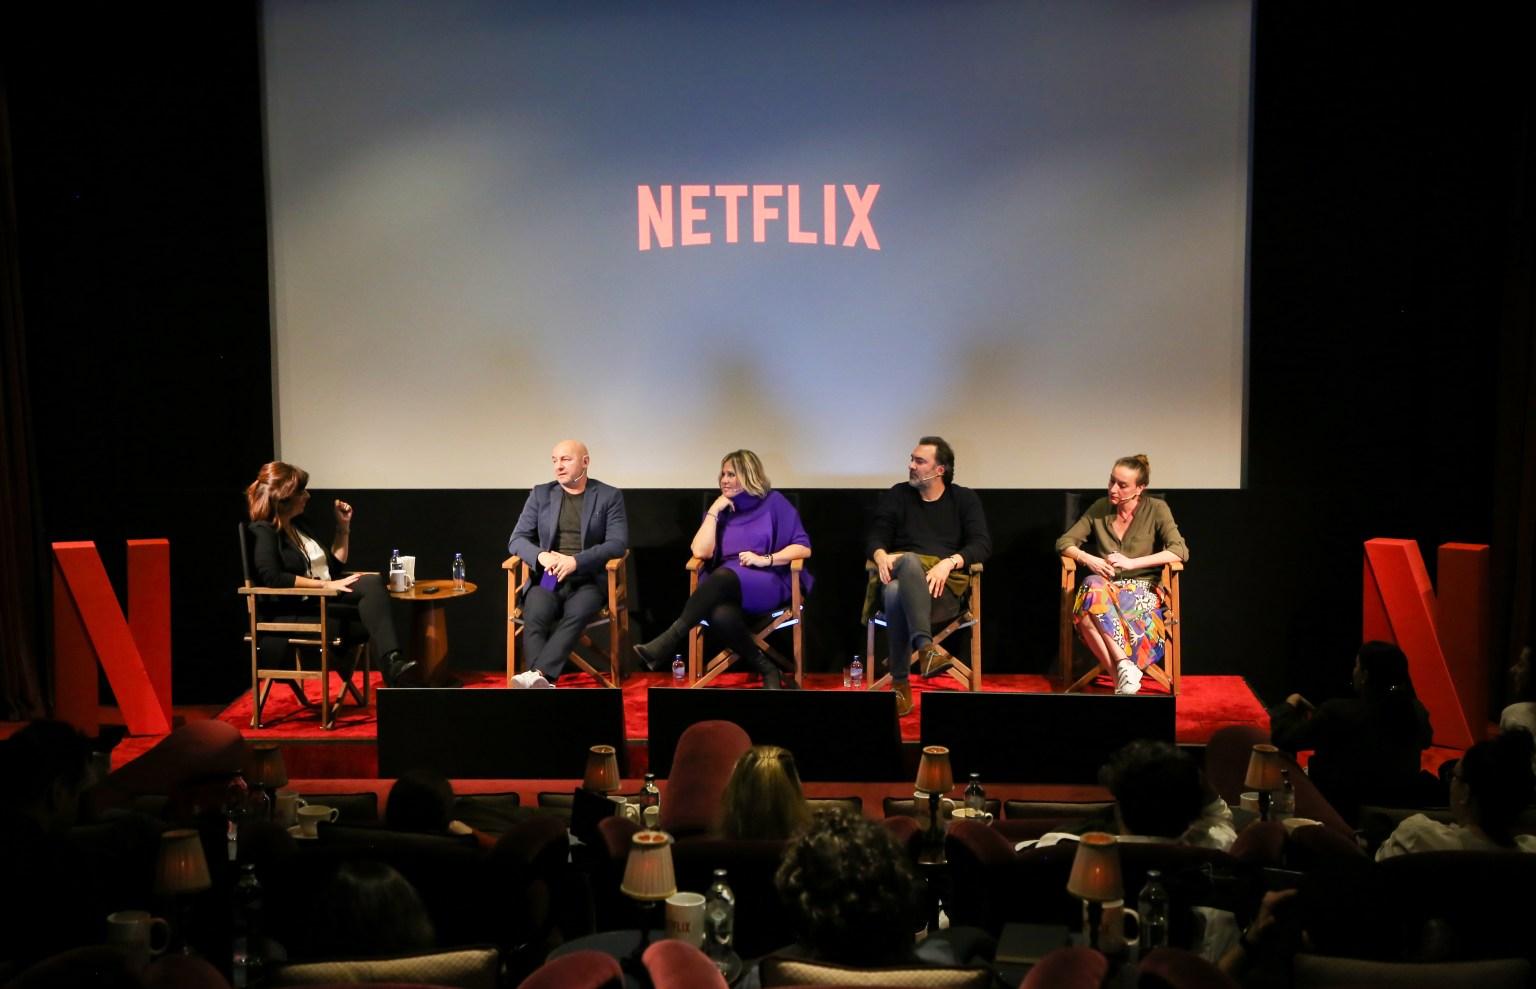 Netflix Türkiye'den Yeni Dizi: Fatma